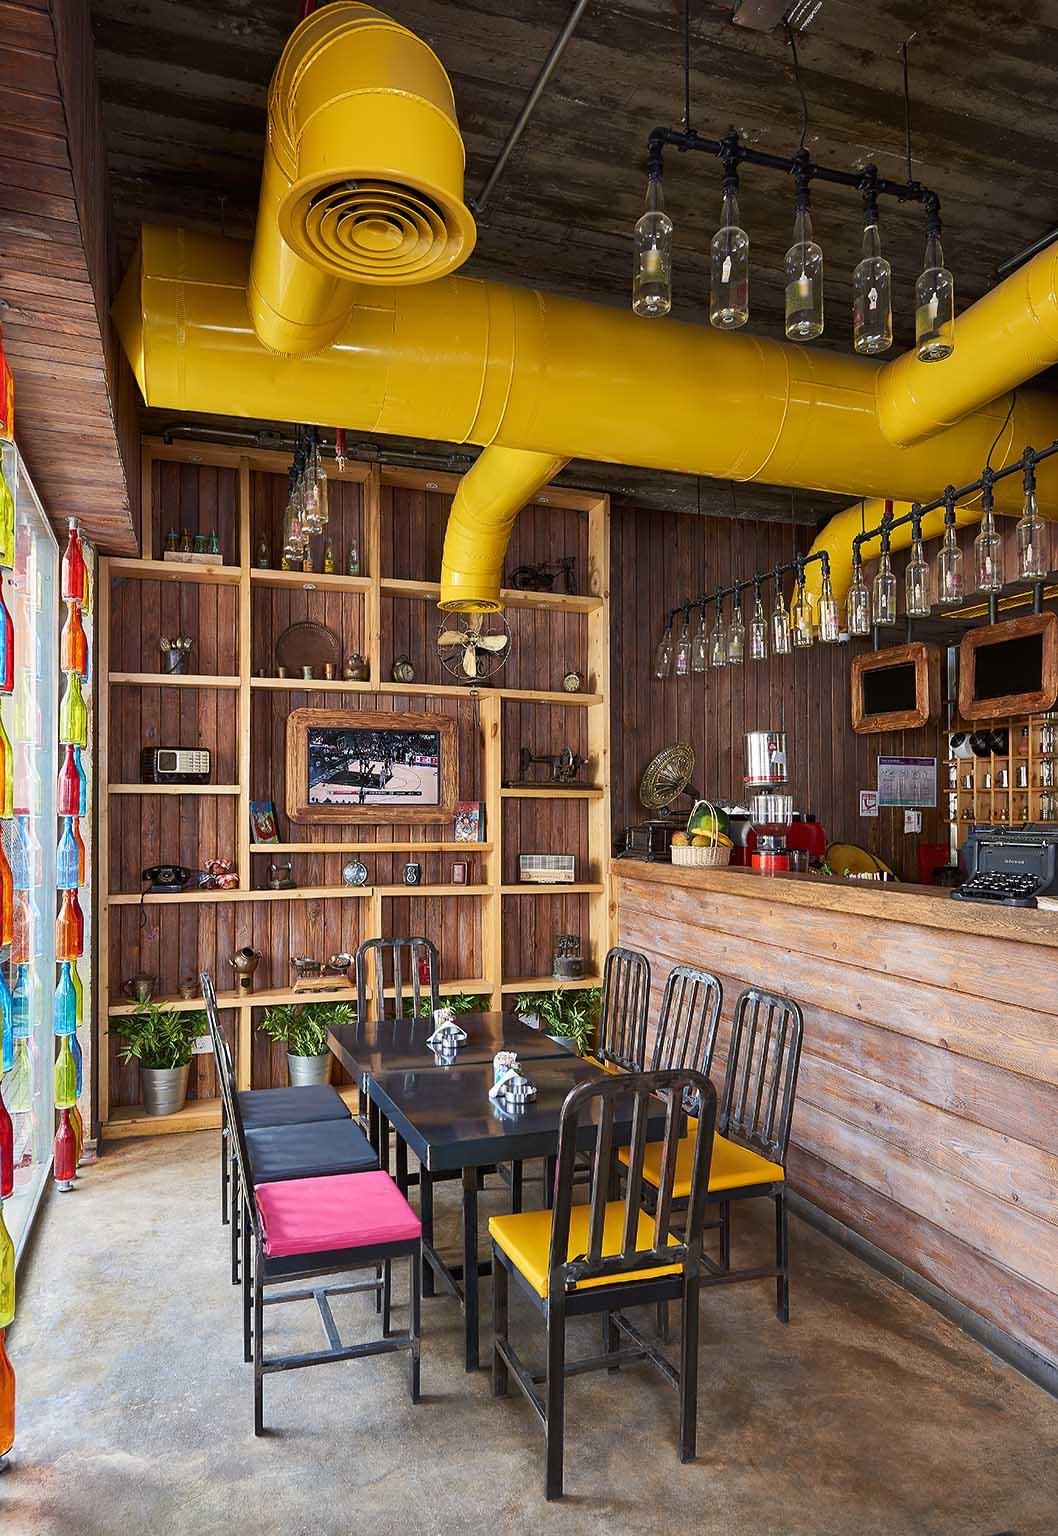 Tabali restaurant interiors shot